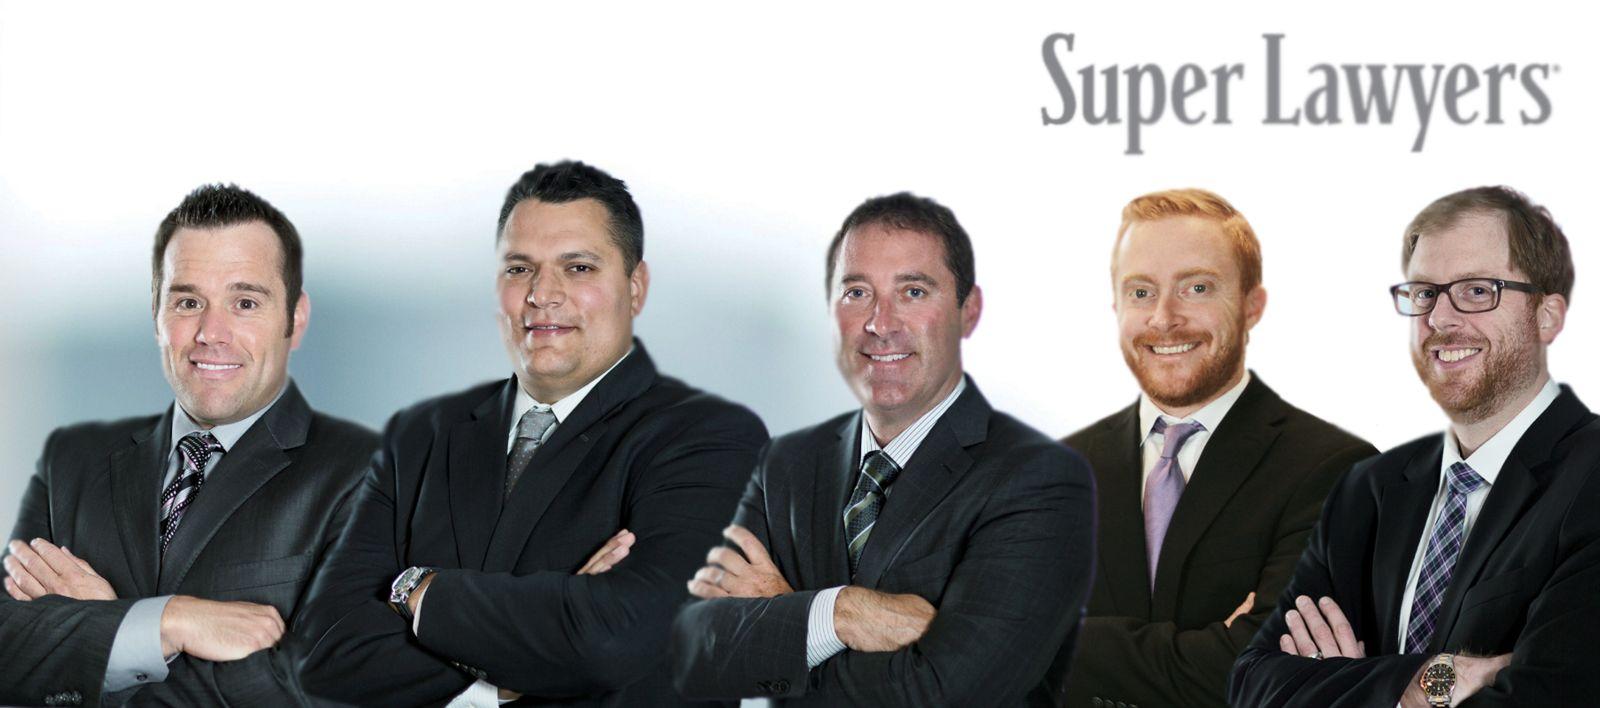 Attorneys Jason Abraham, Chad Kreblin, Brandon Derry, Rober t Domol highligheted by Super Lawyers